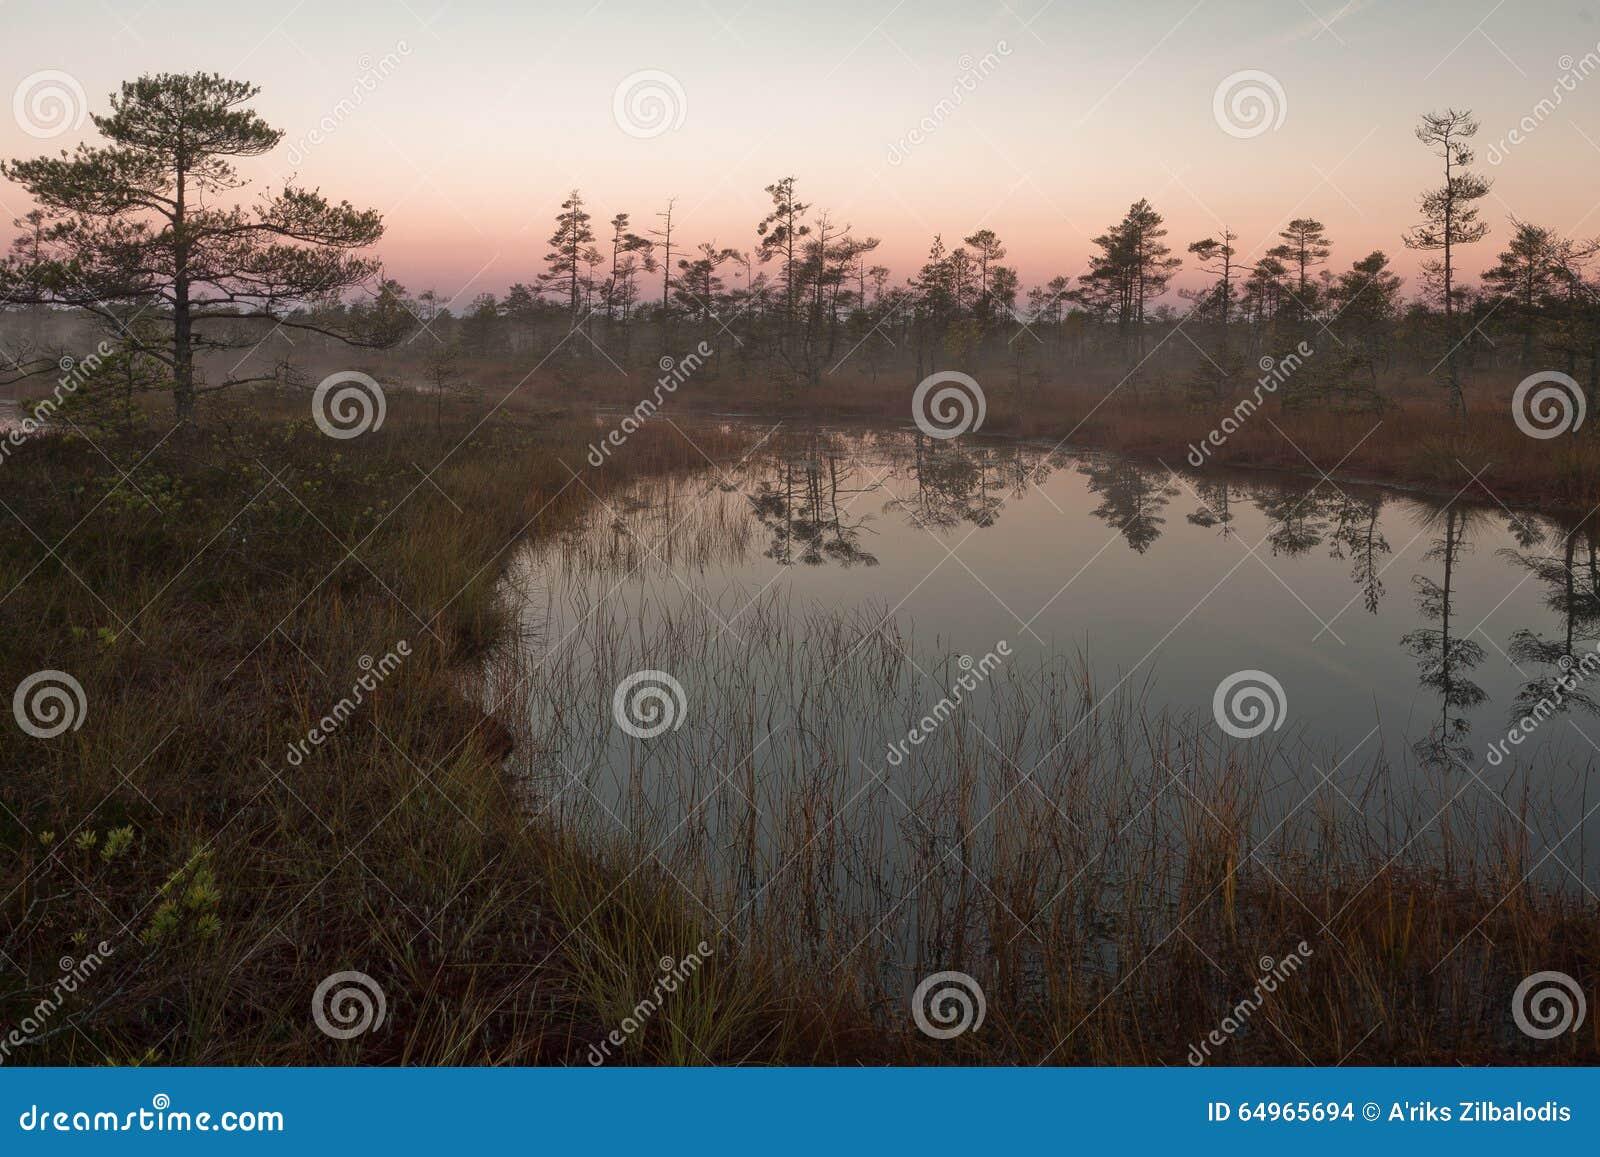 Cena bog in early morning